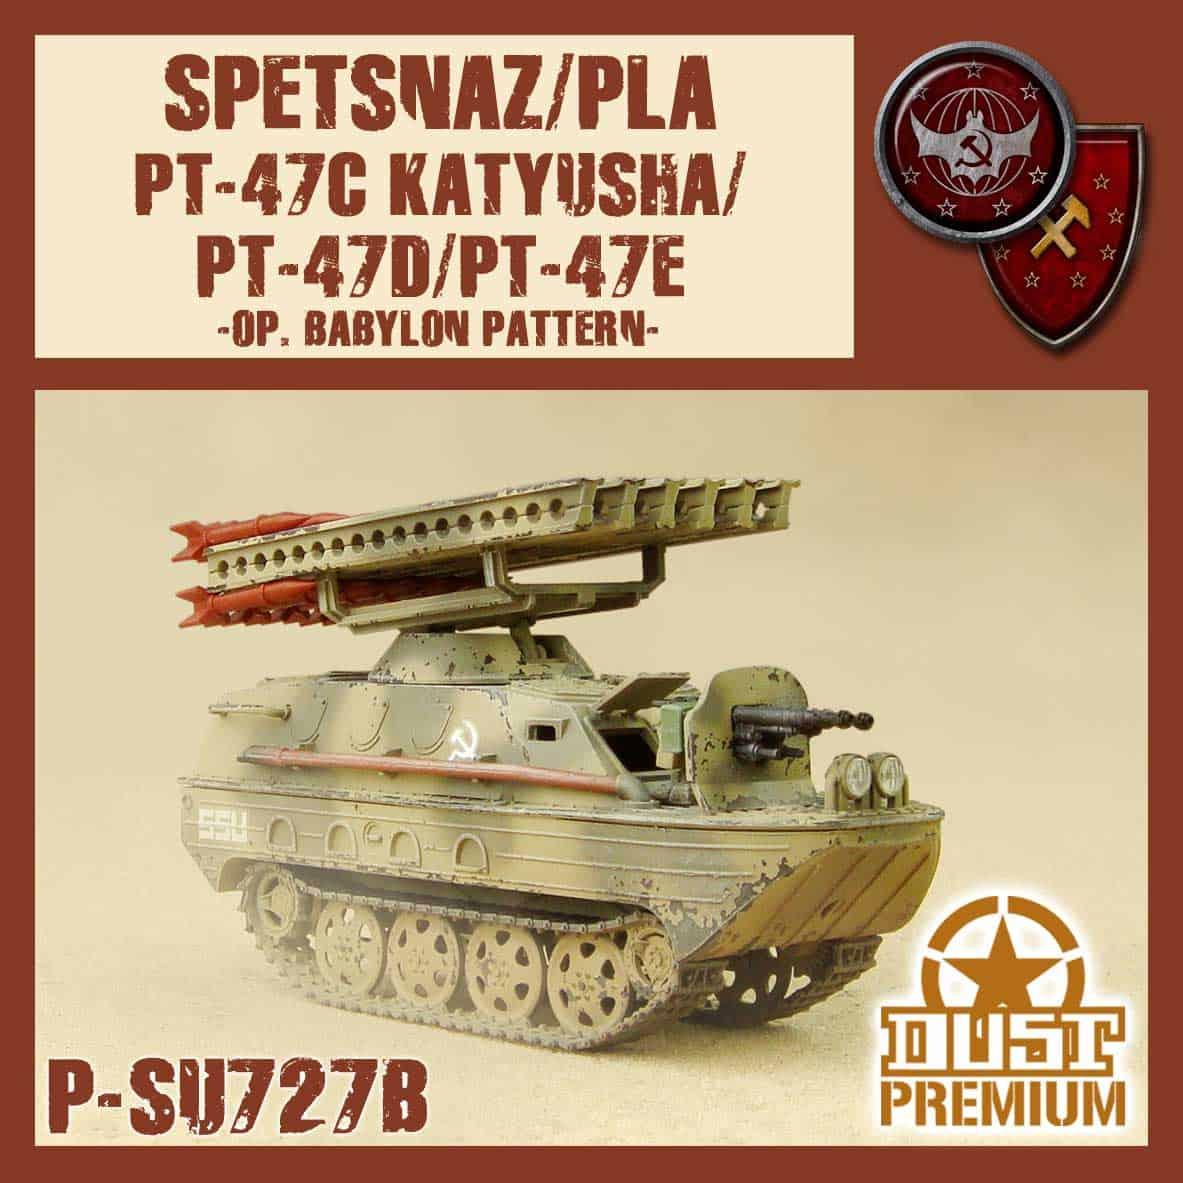 PT-47A C/D/E Babylon Pattern